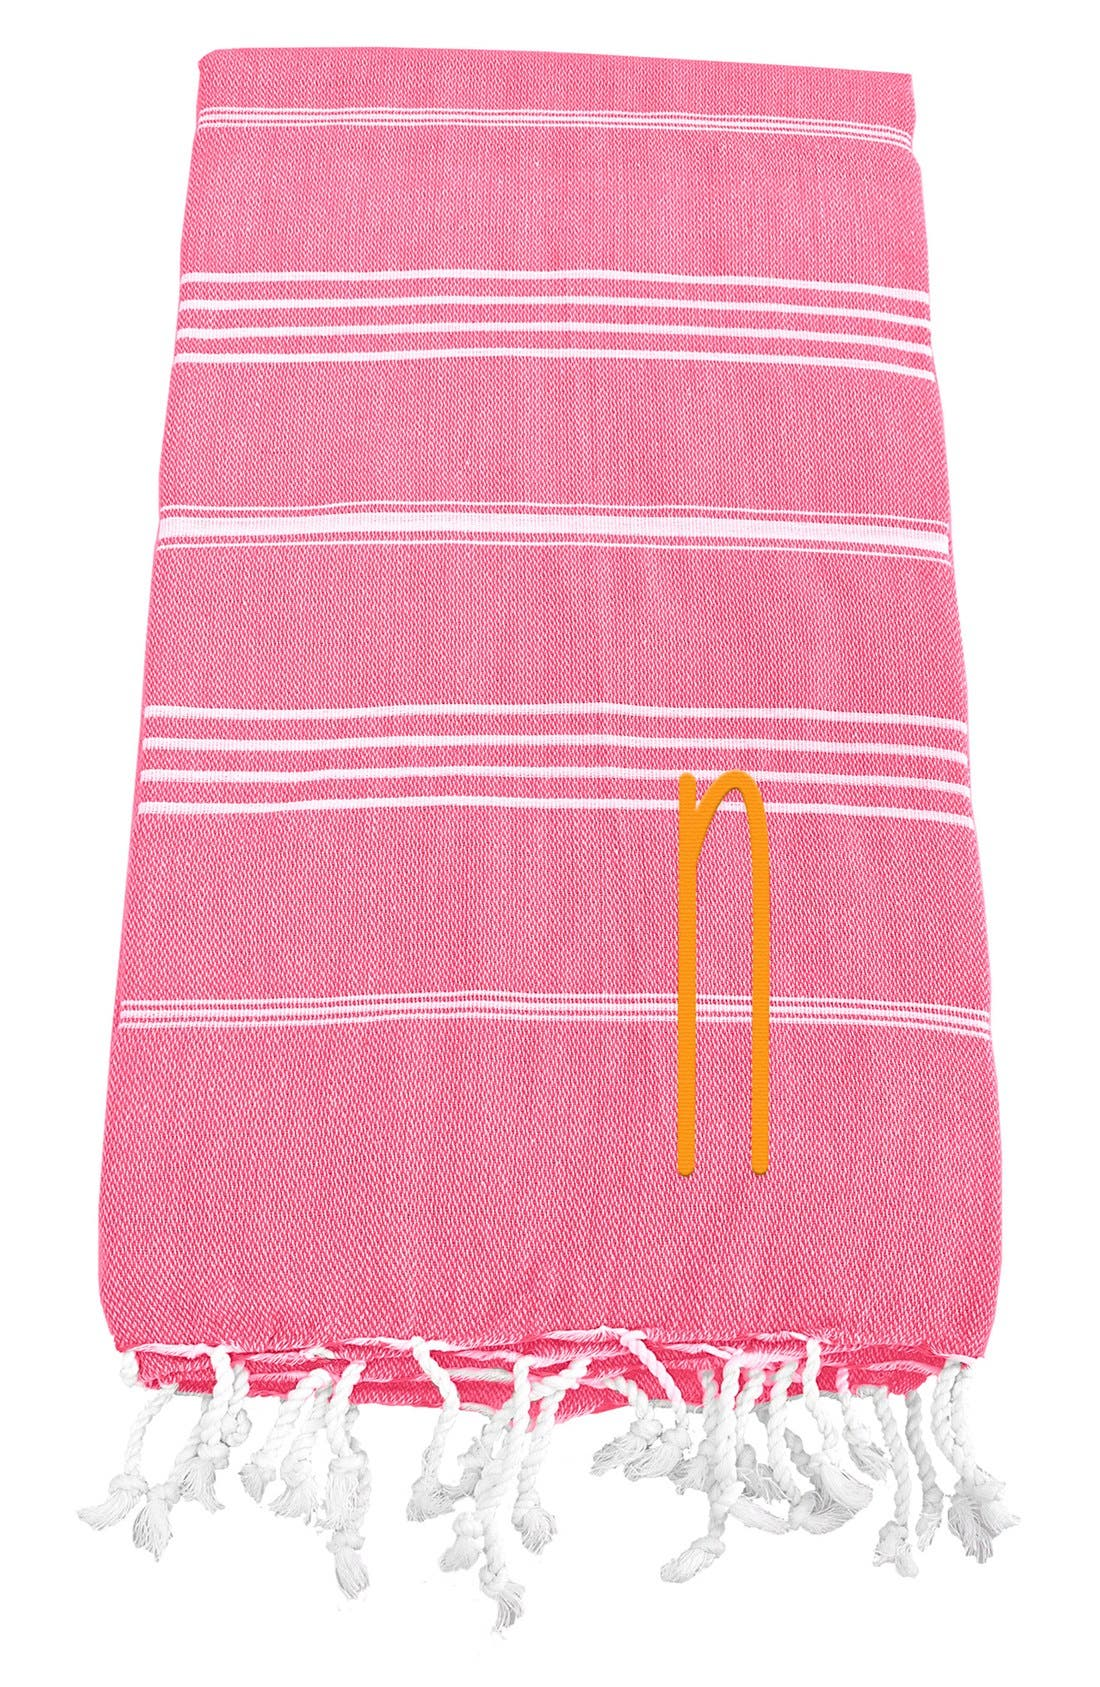 Monogram Turkish Cotton Towel,                             Main thumbnail 150, color,